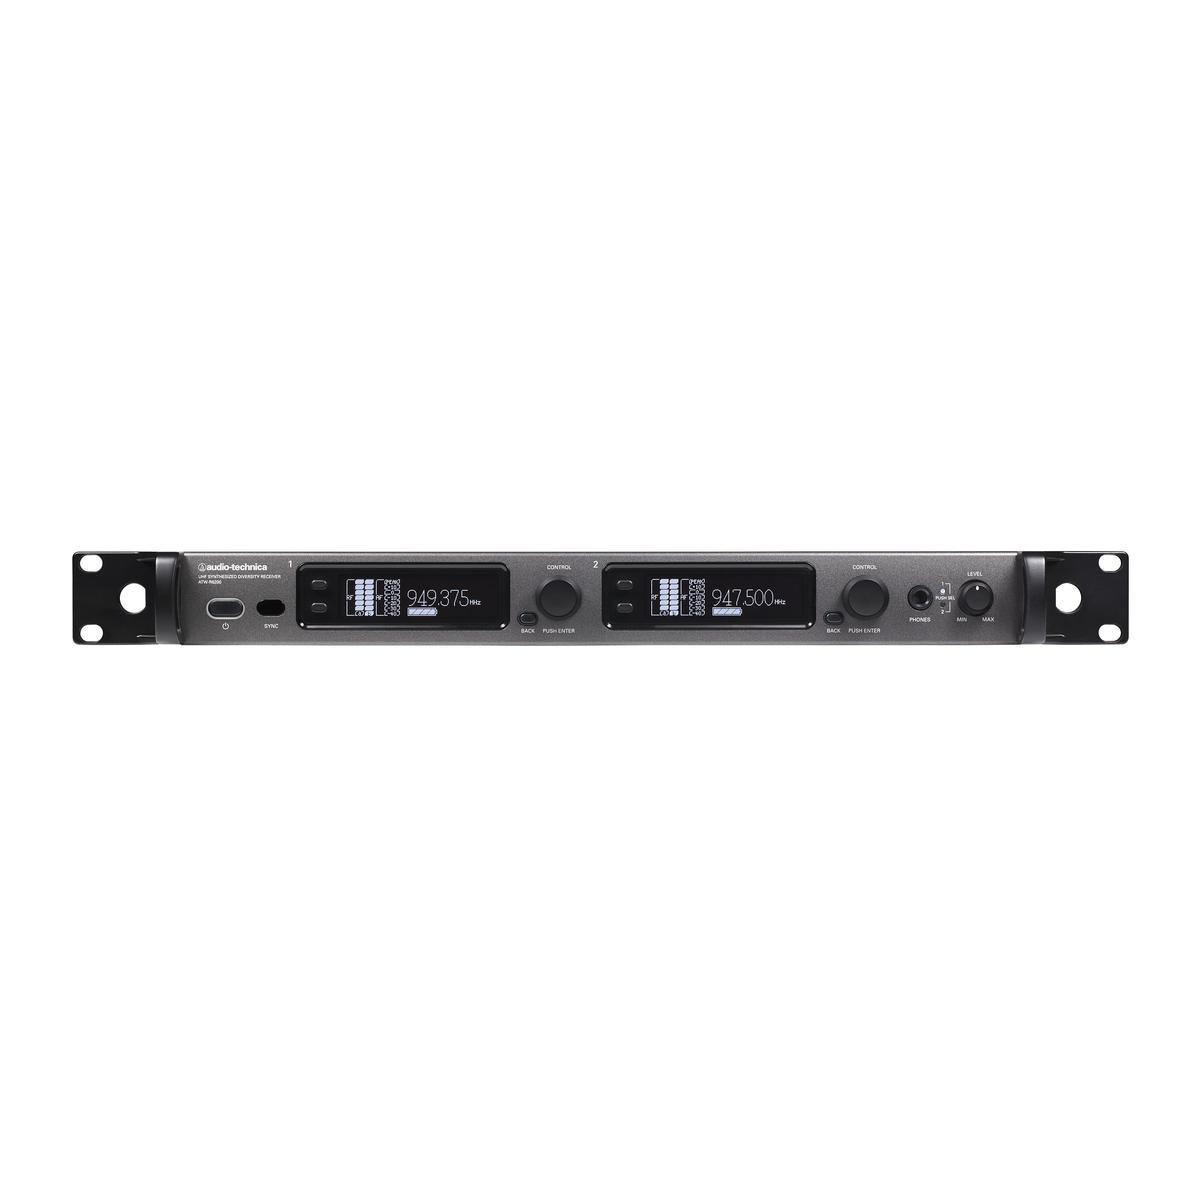 Atw R6200 Uhf Synthesized Diversity Receiver Audio